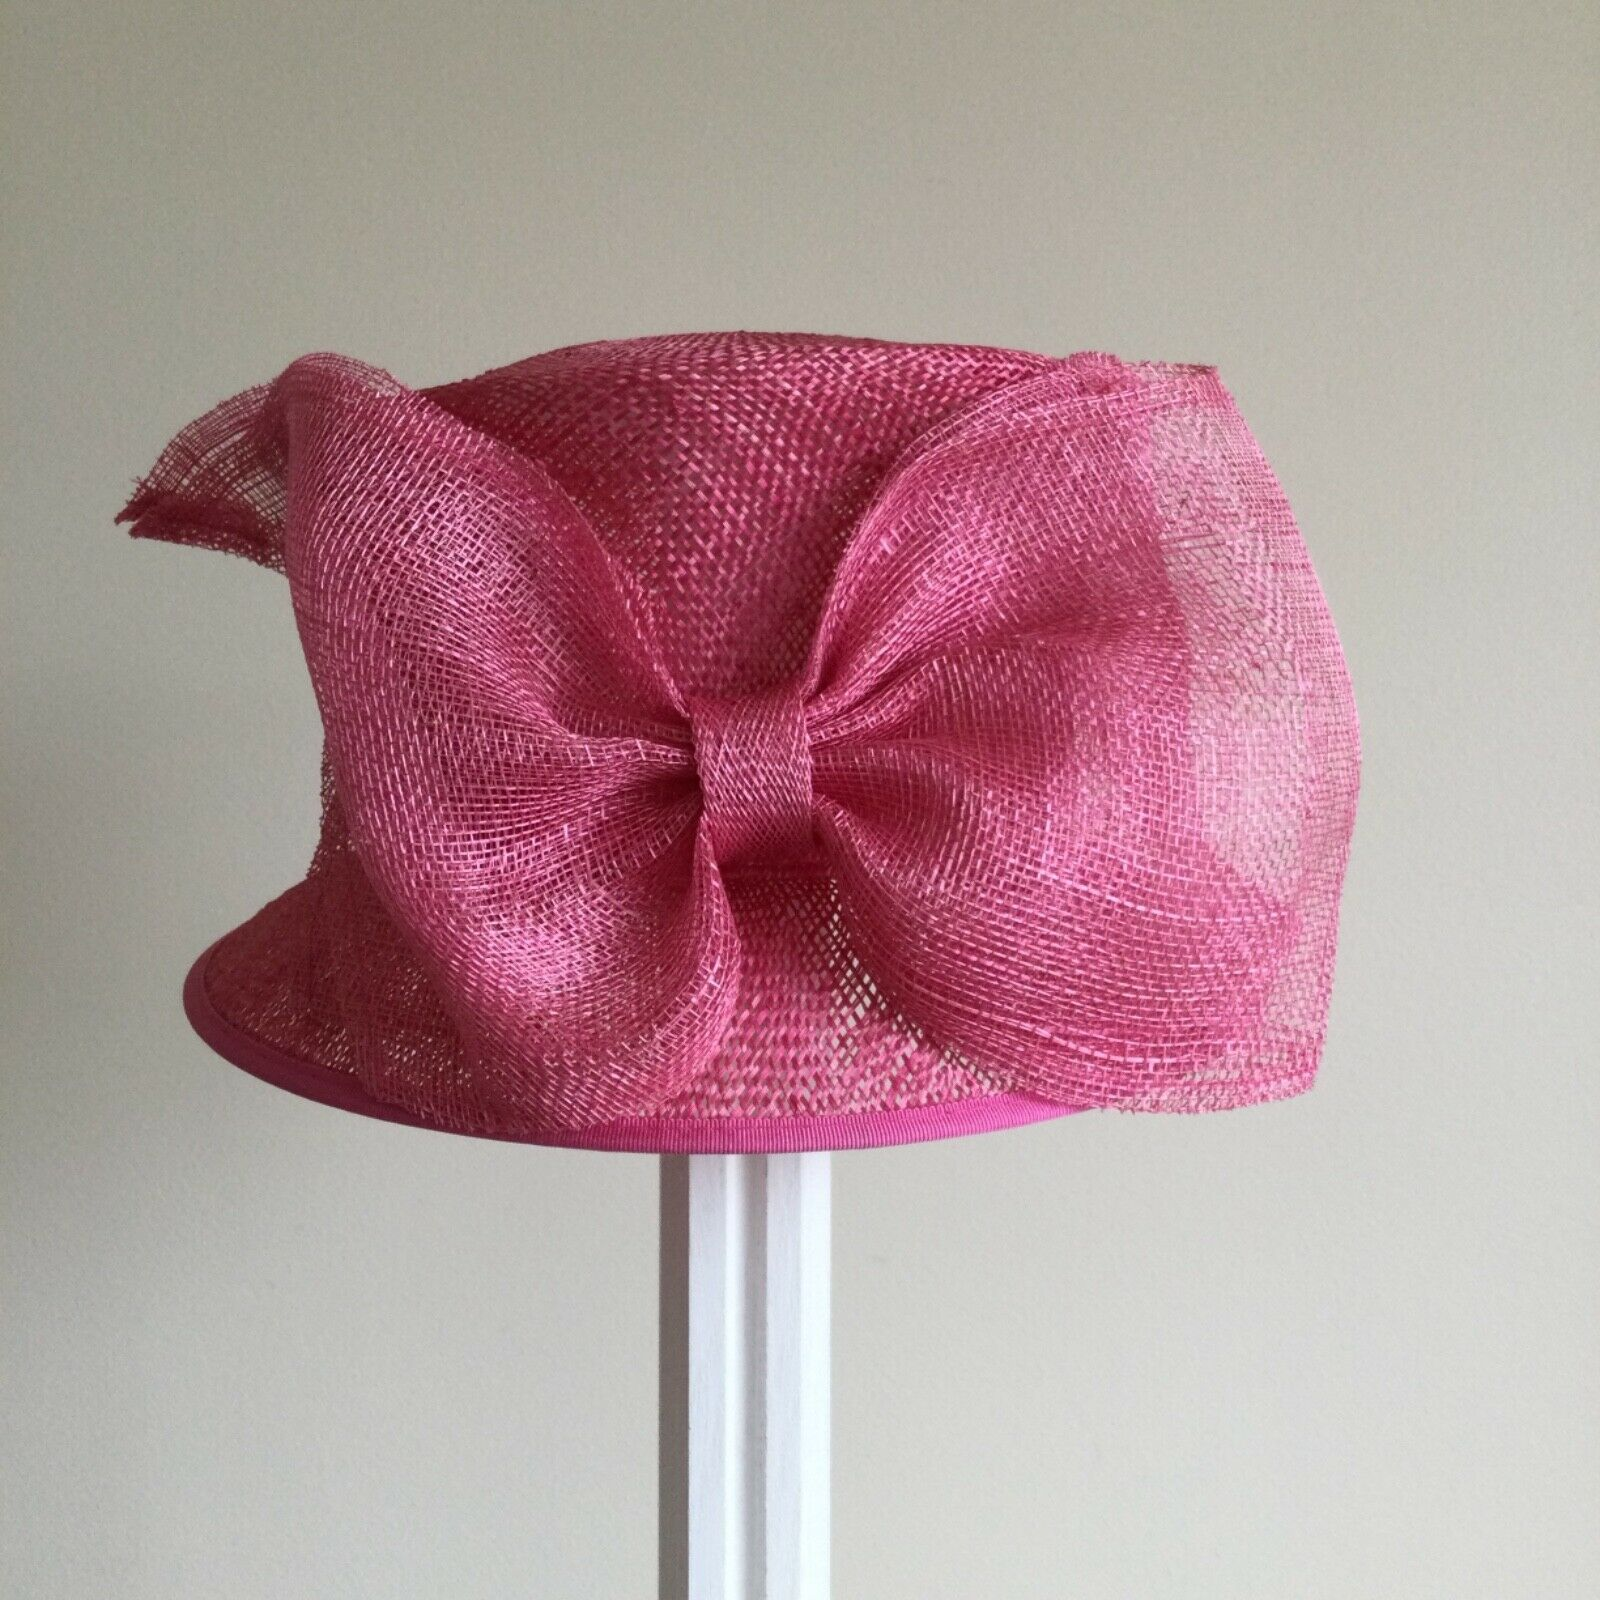 Ladies Whiteley Pink 100% Straw Brim Hat with Large Bow Trim .